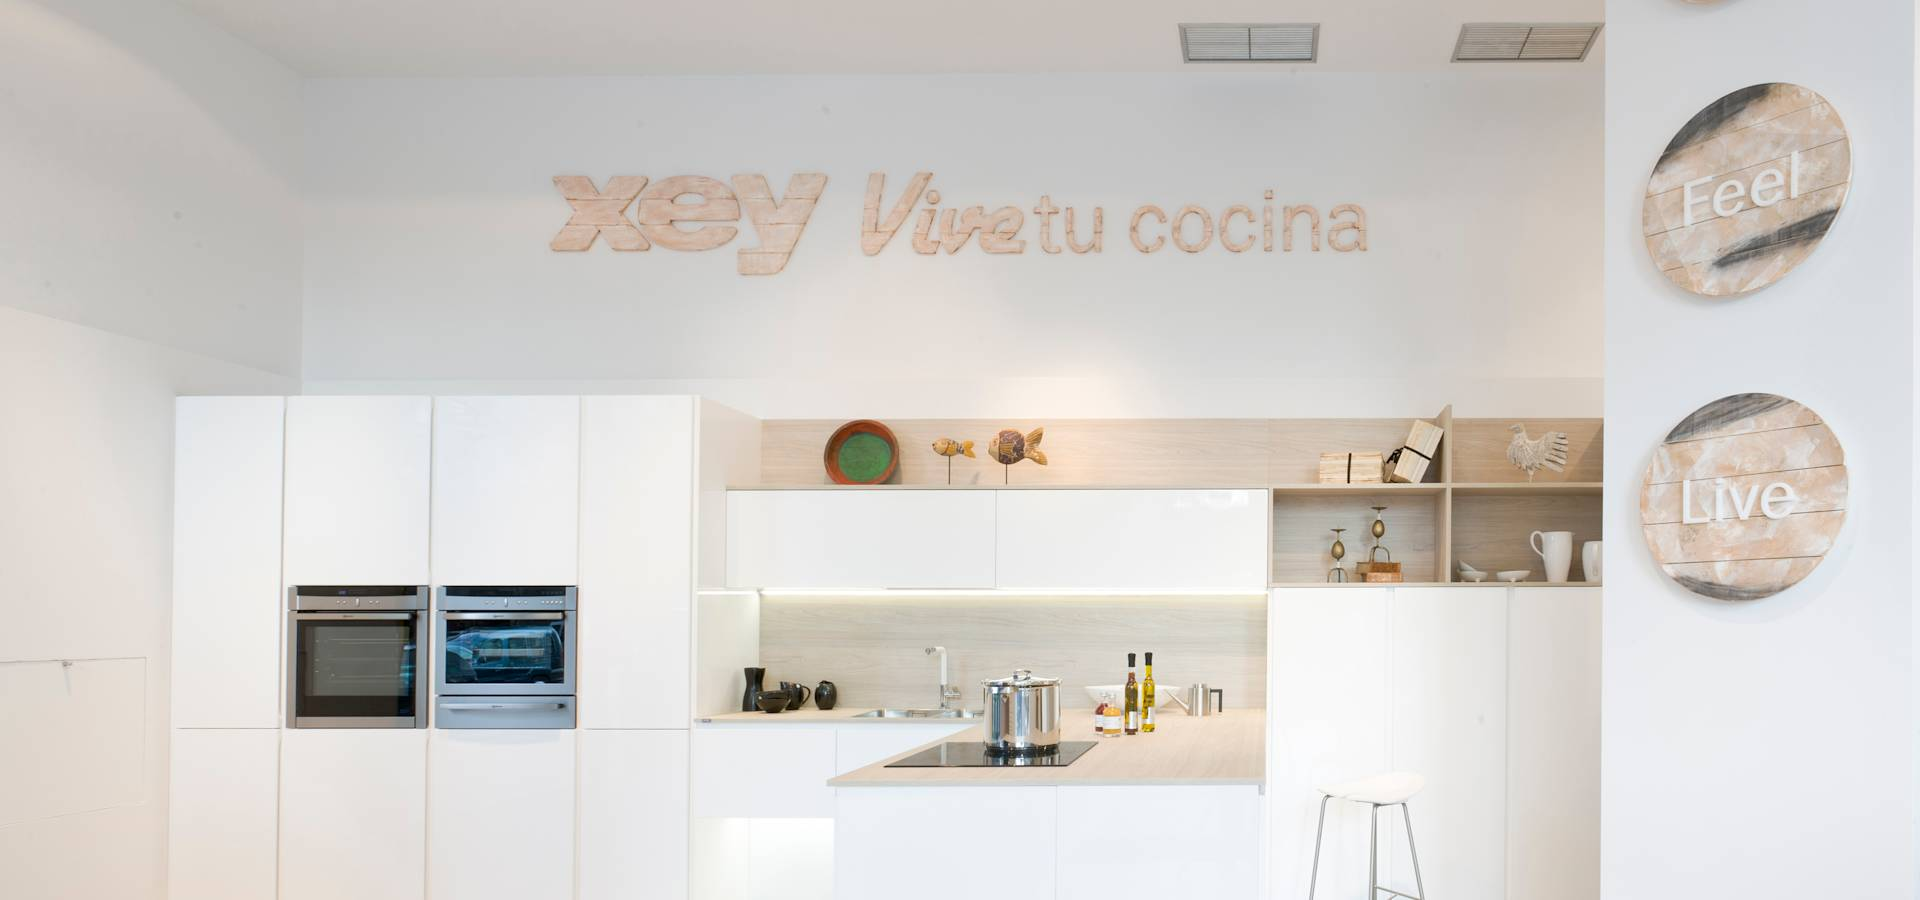 Xey corporaci n empresarial dise adores de cocinas en - Disenadores de cocinas ...